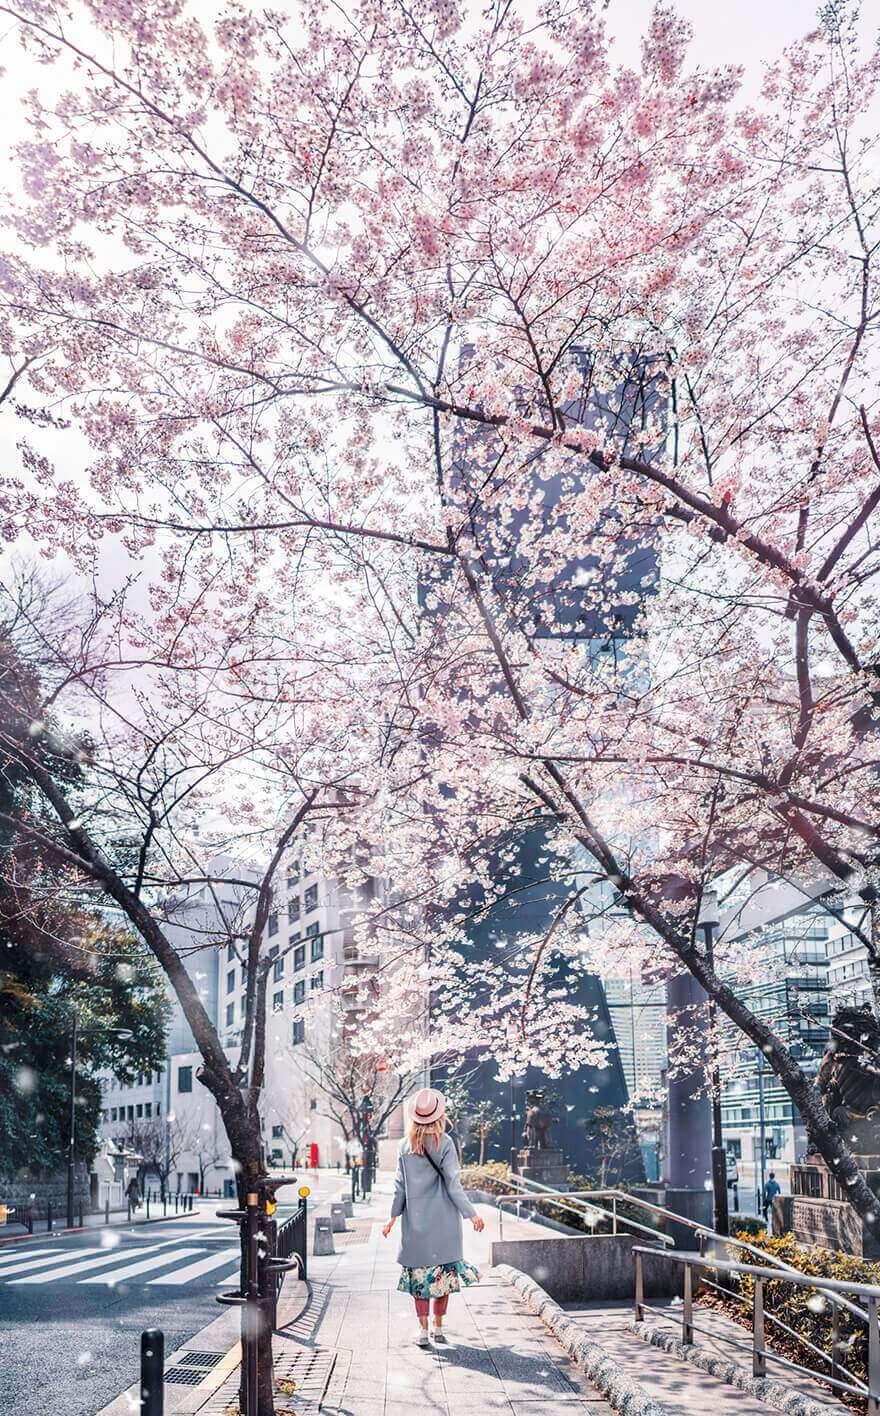 Цветение сакуры в Японии, Токио, Асакуса